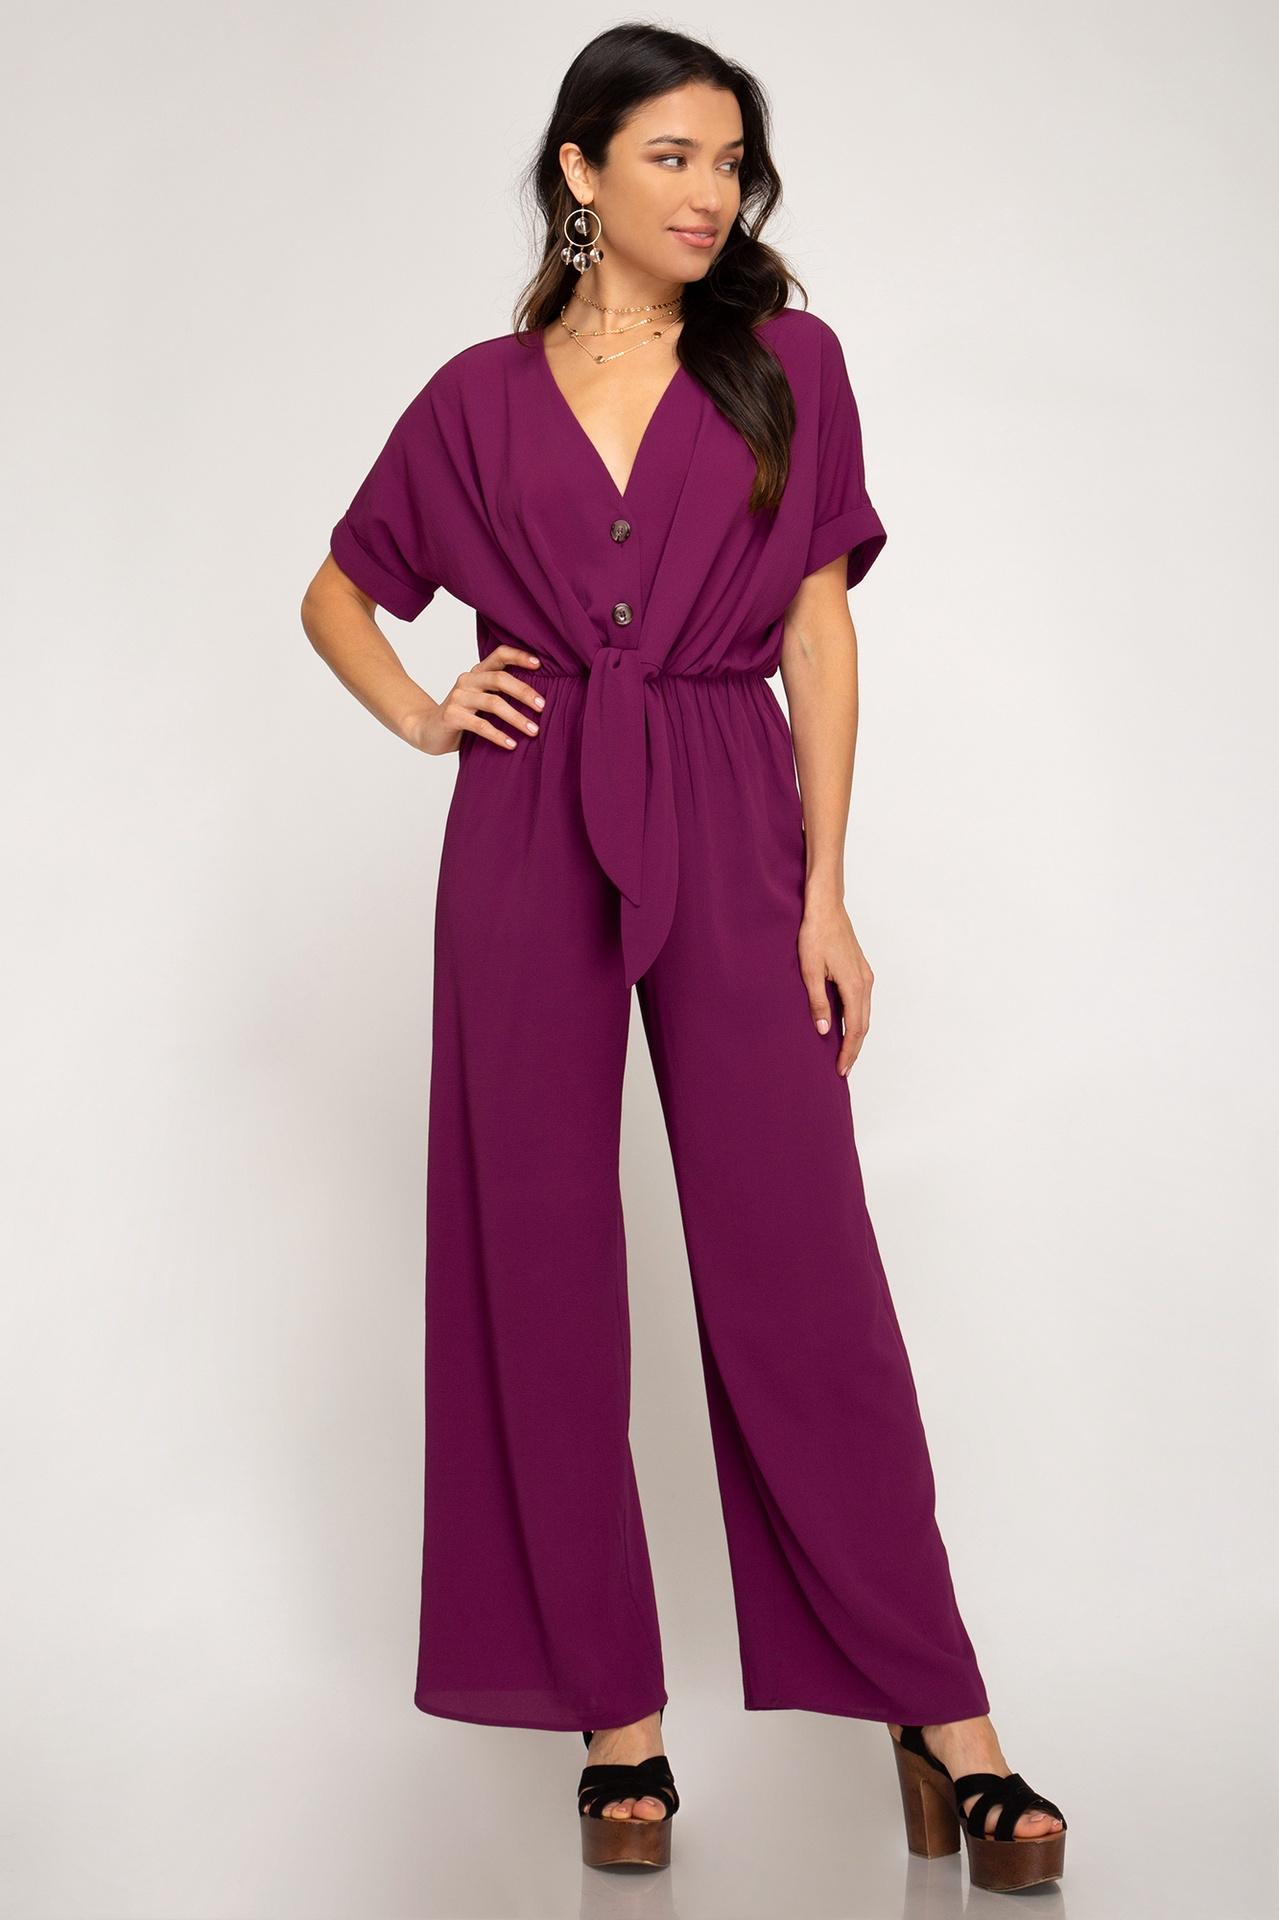 Magenta Purple Wide Leg Jumpsuit w Tie & Buttons Up Front